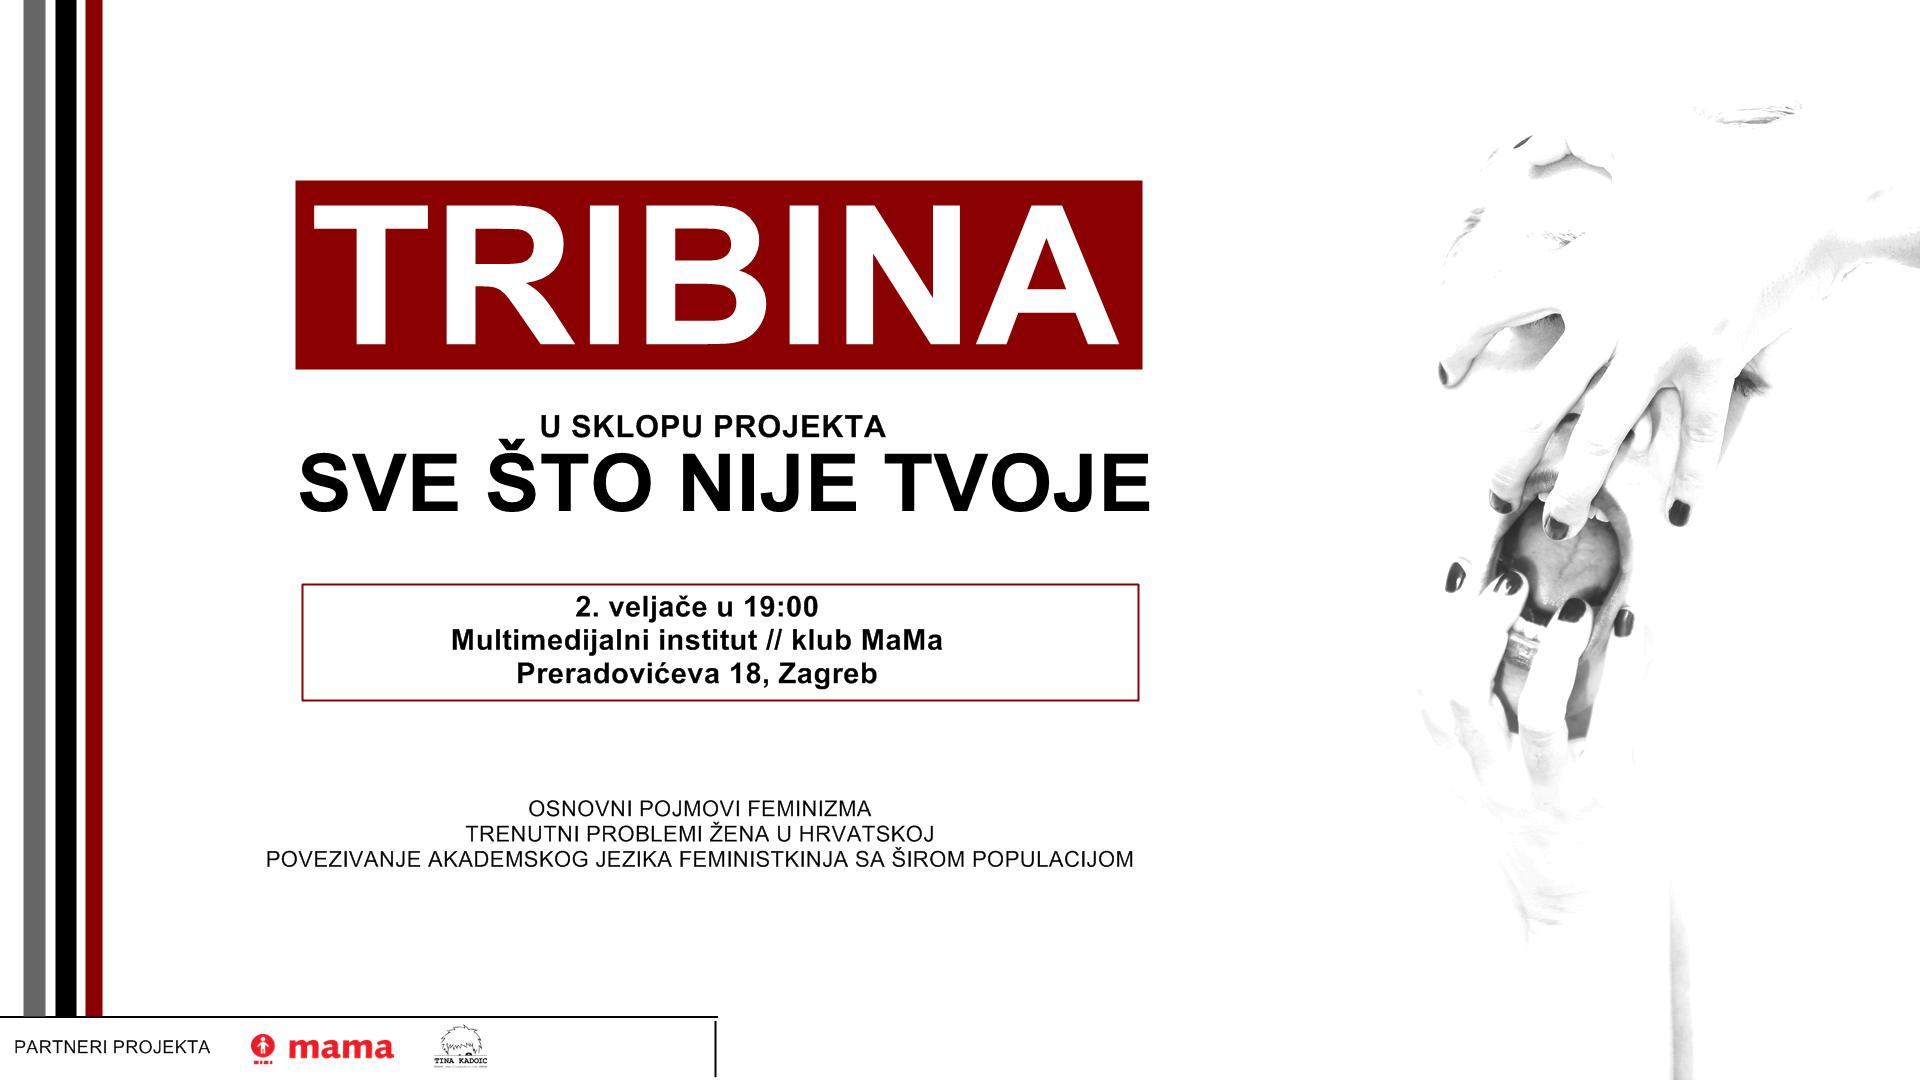 fb-tribina-event